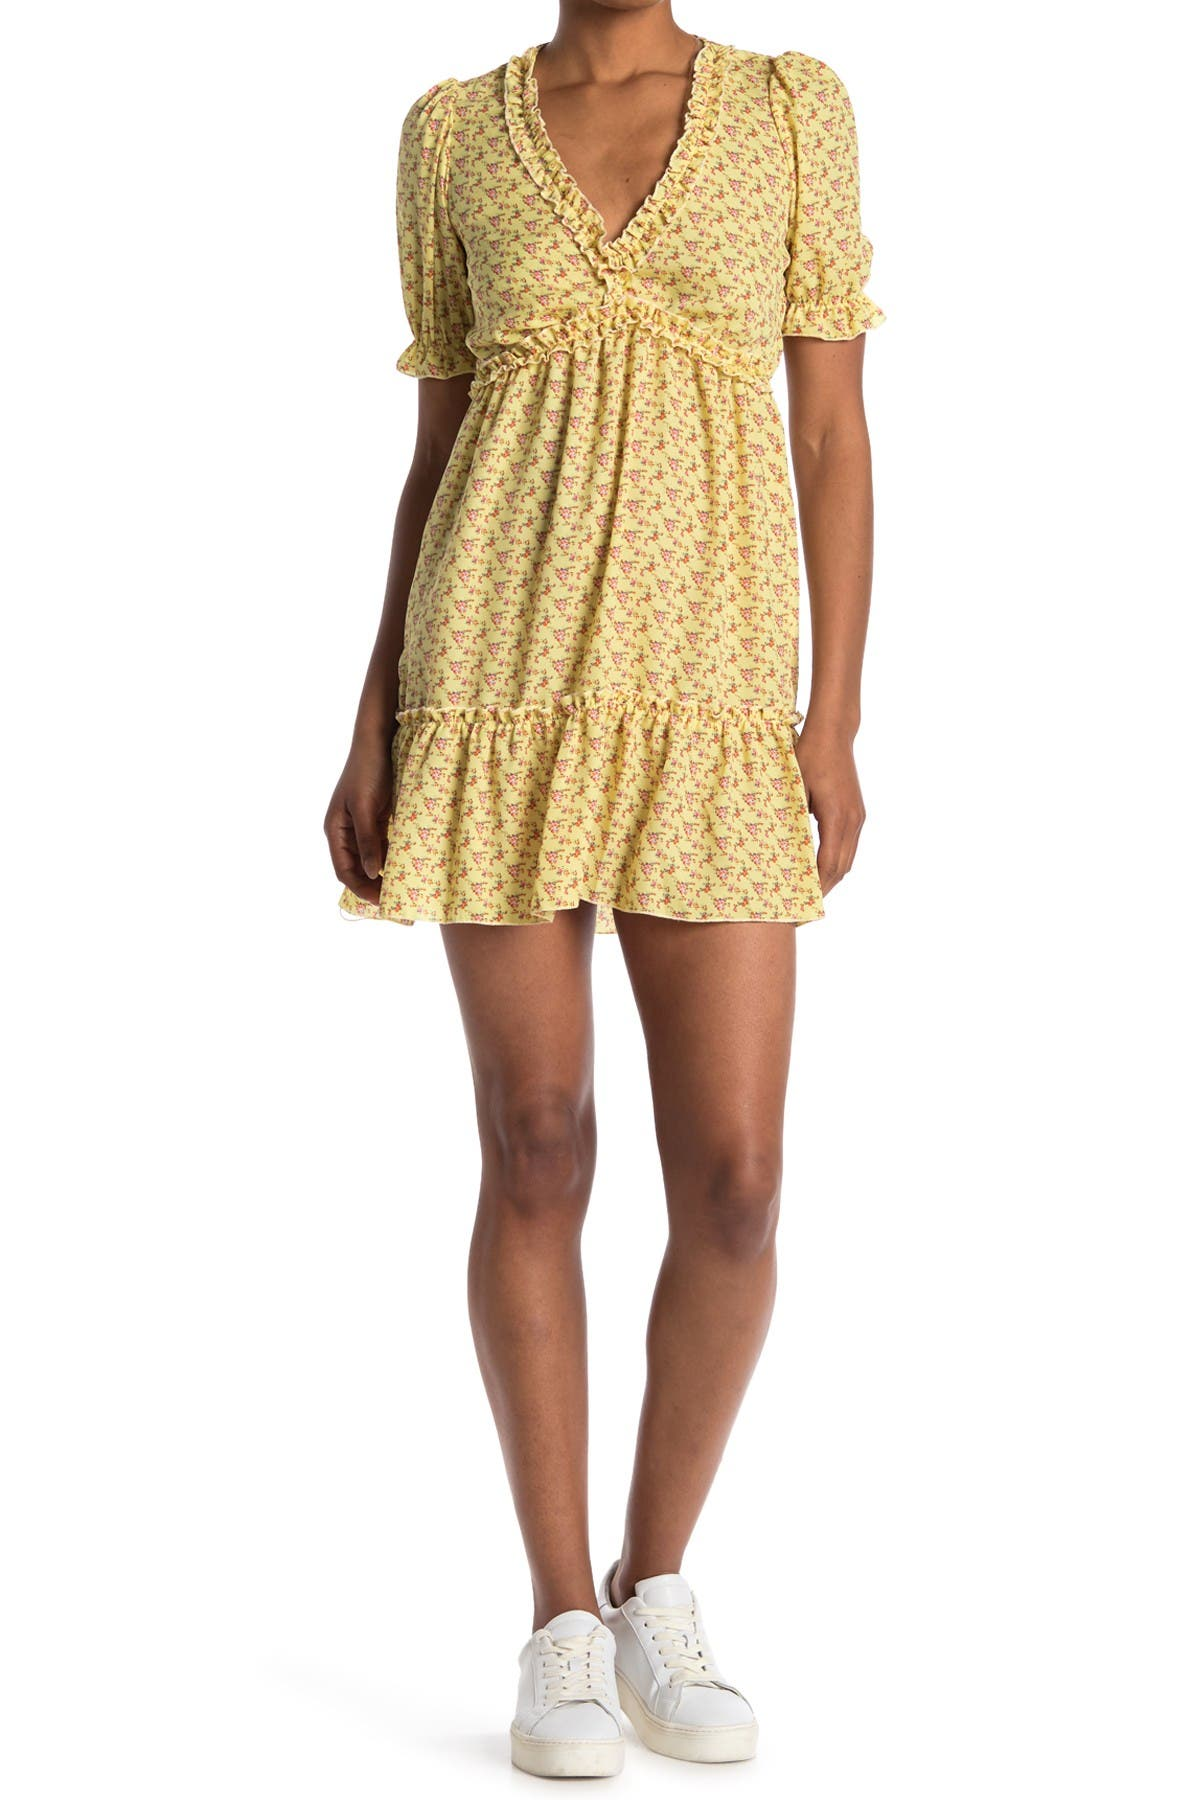 Image of KENEDIK Ruffle Trim Floral Print Babydoll Dress